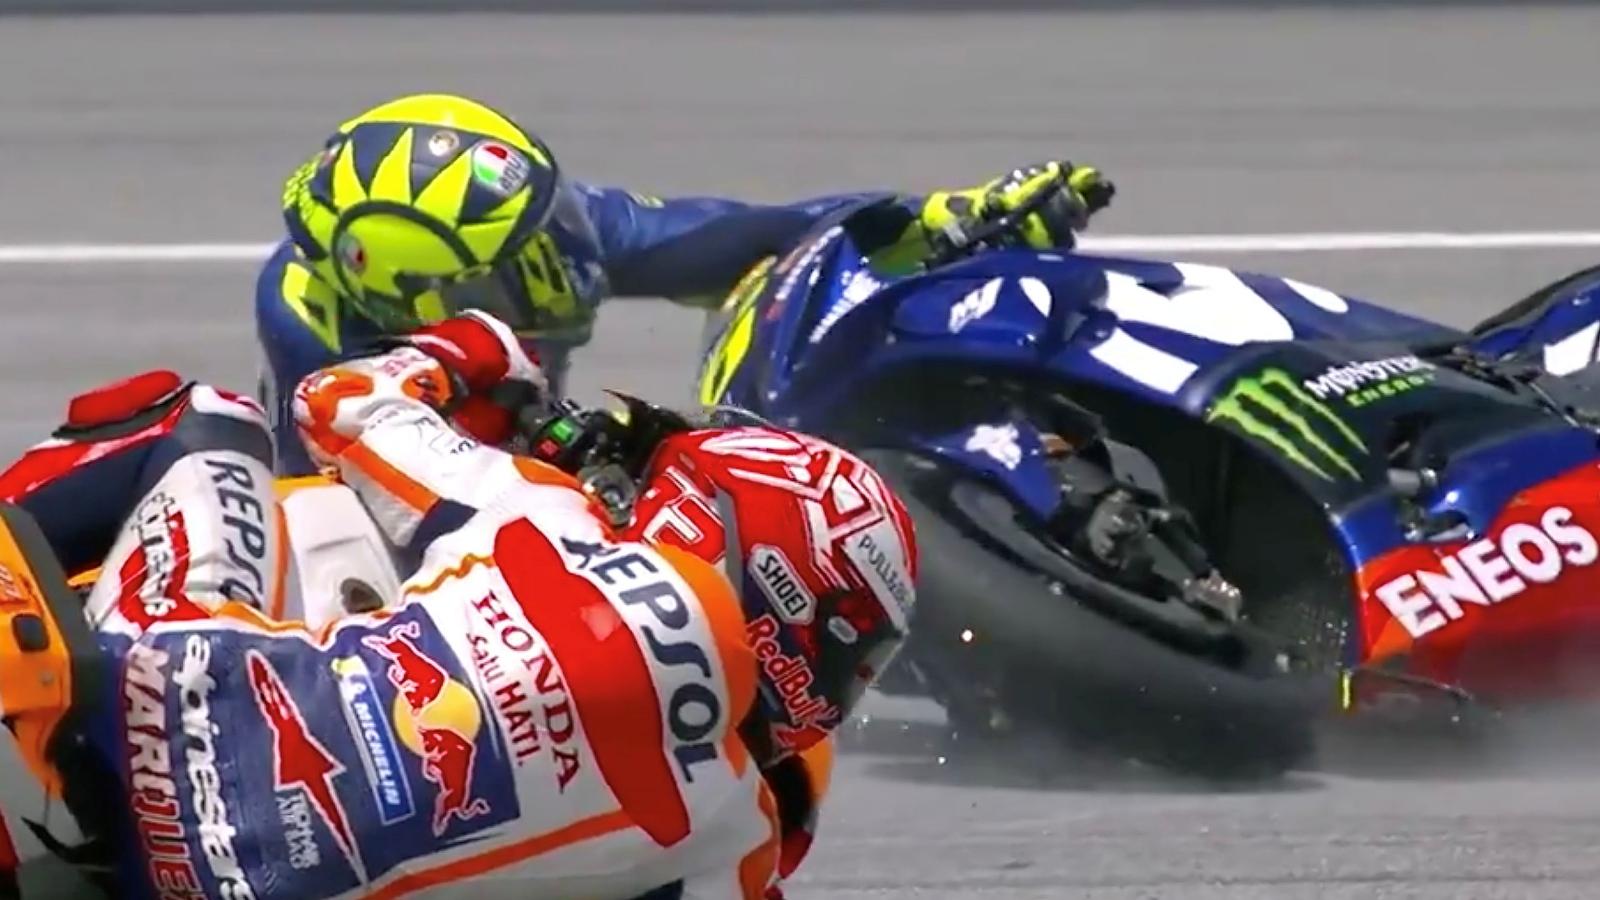 25 años Valentino Rossi: 2018 – 3º MotoGP – Yamaha YZR-M1 / Movistar Yamaha MotoGP